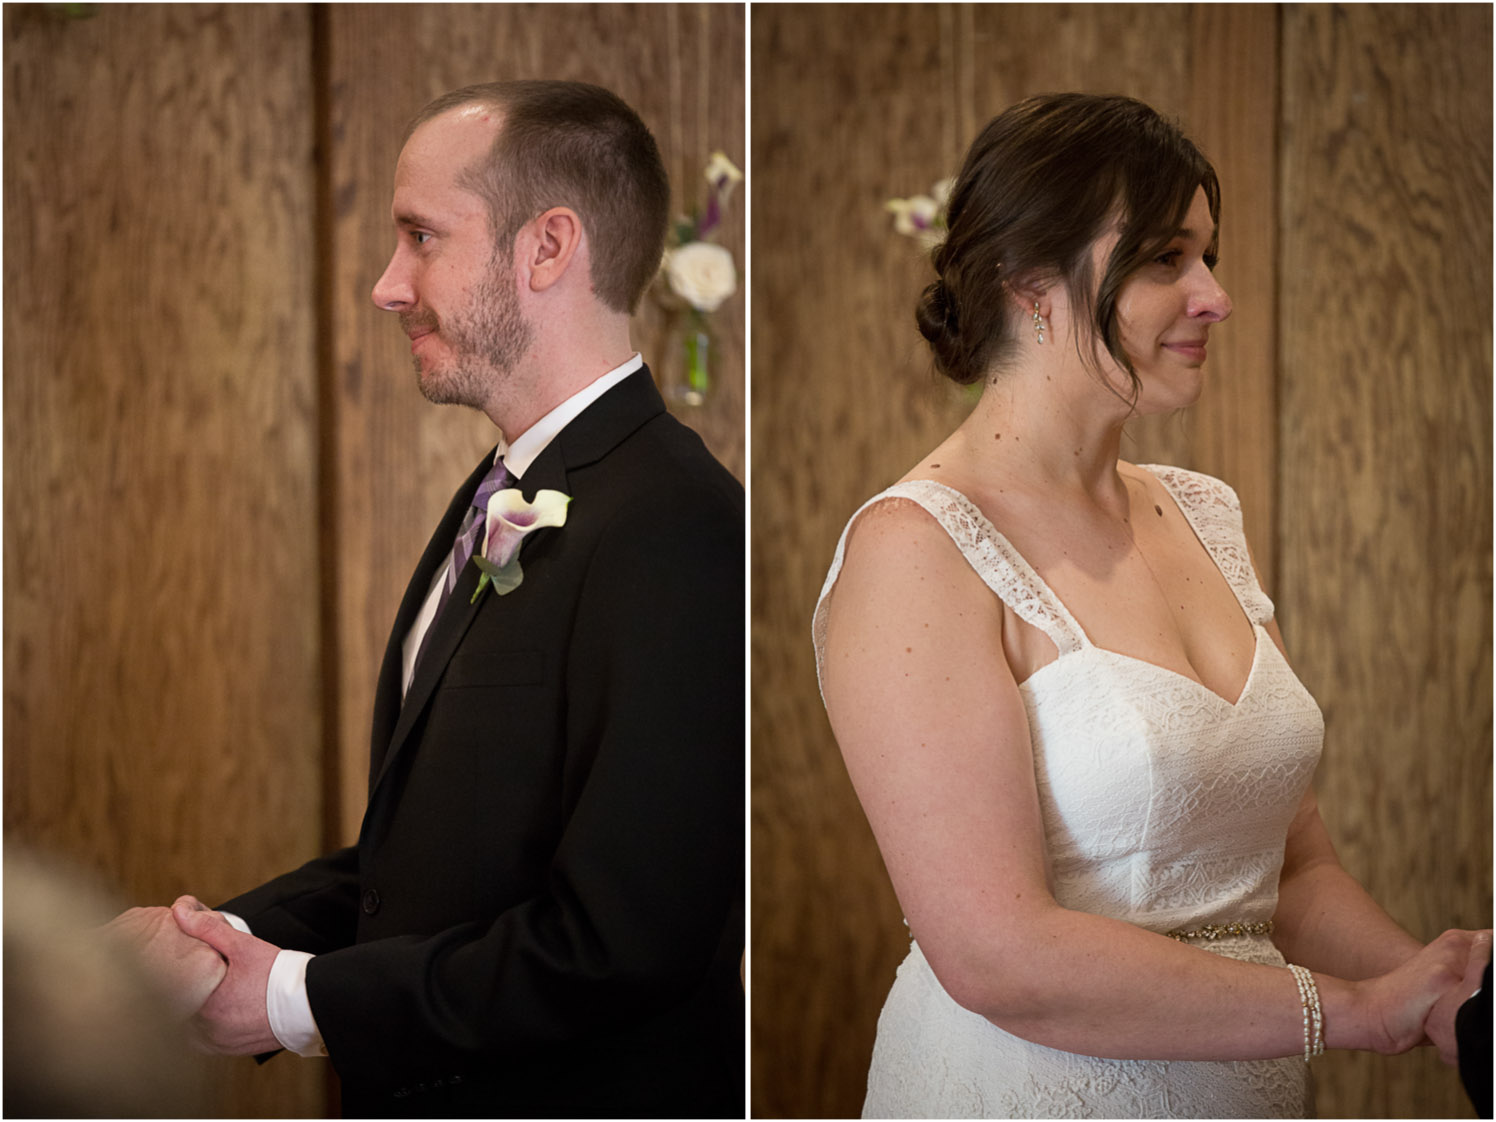 11-cornerstone-studios-wedding-professionals-small-events-ceremony-mahonen-photography.jpg